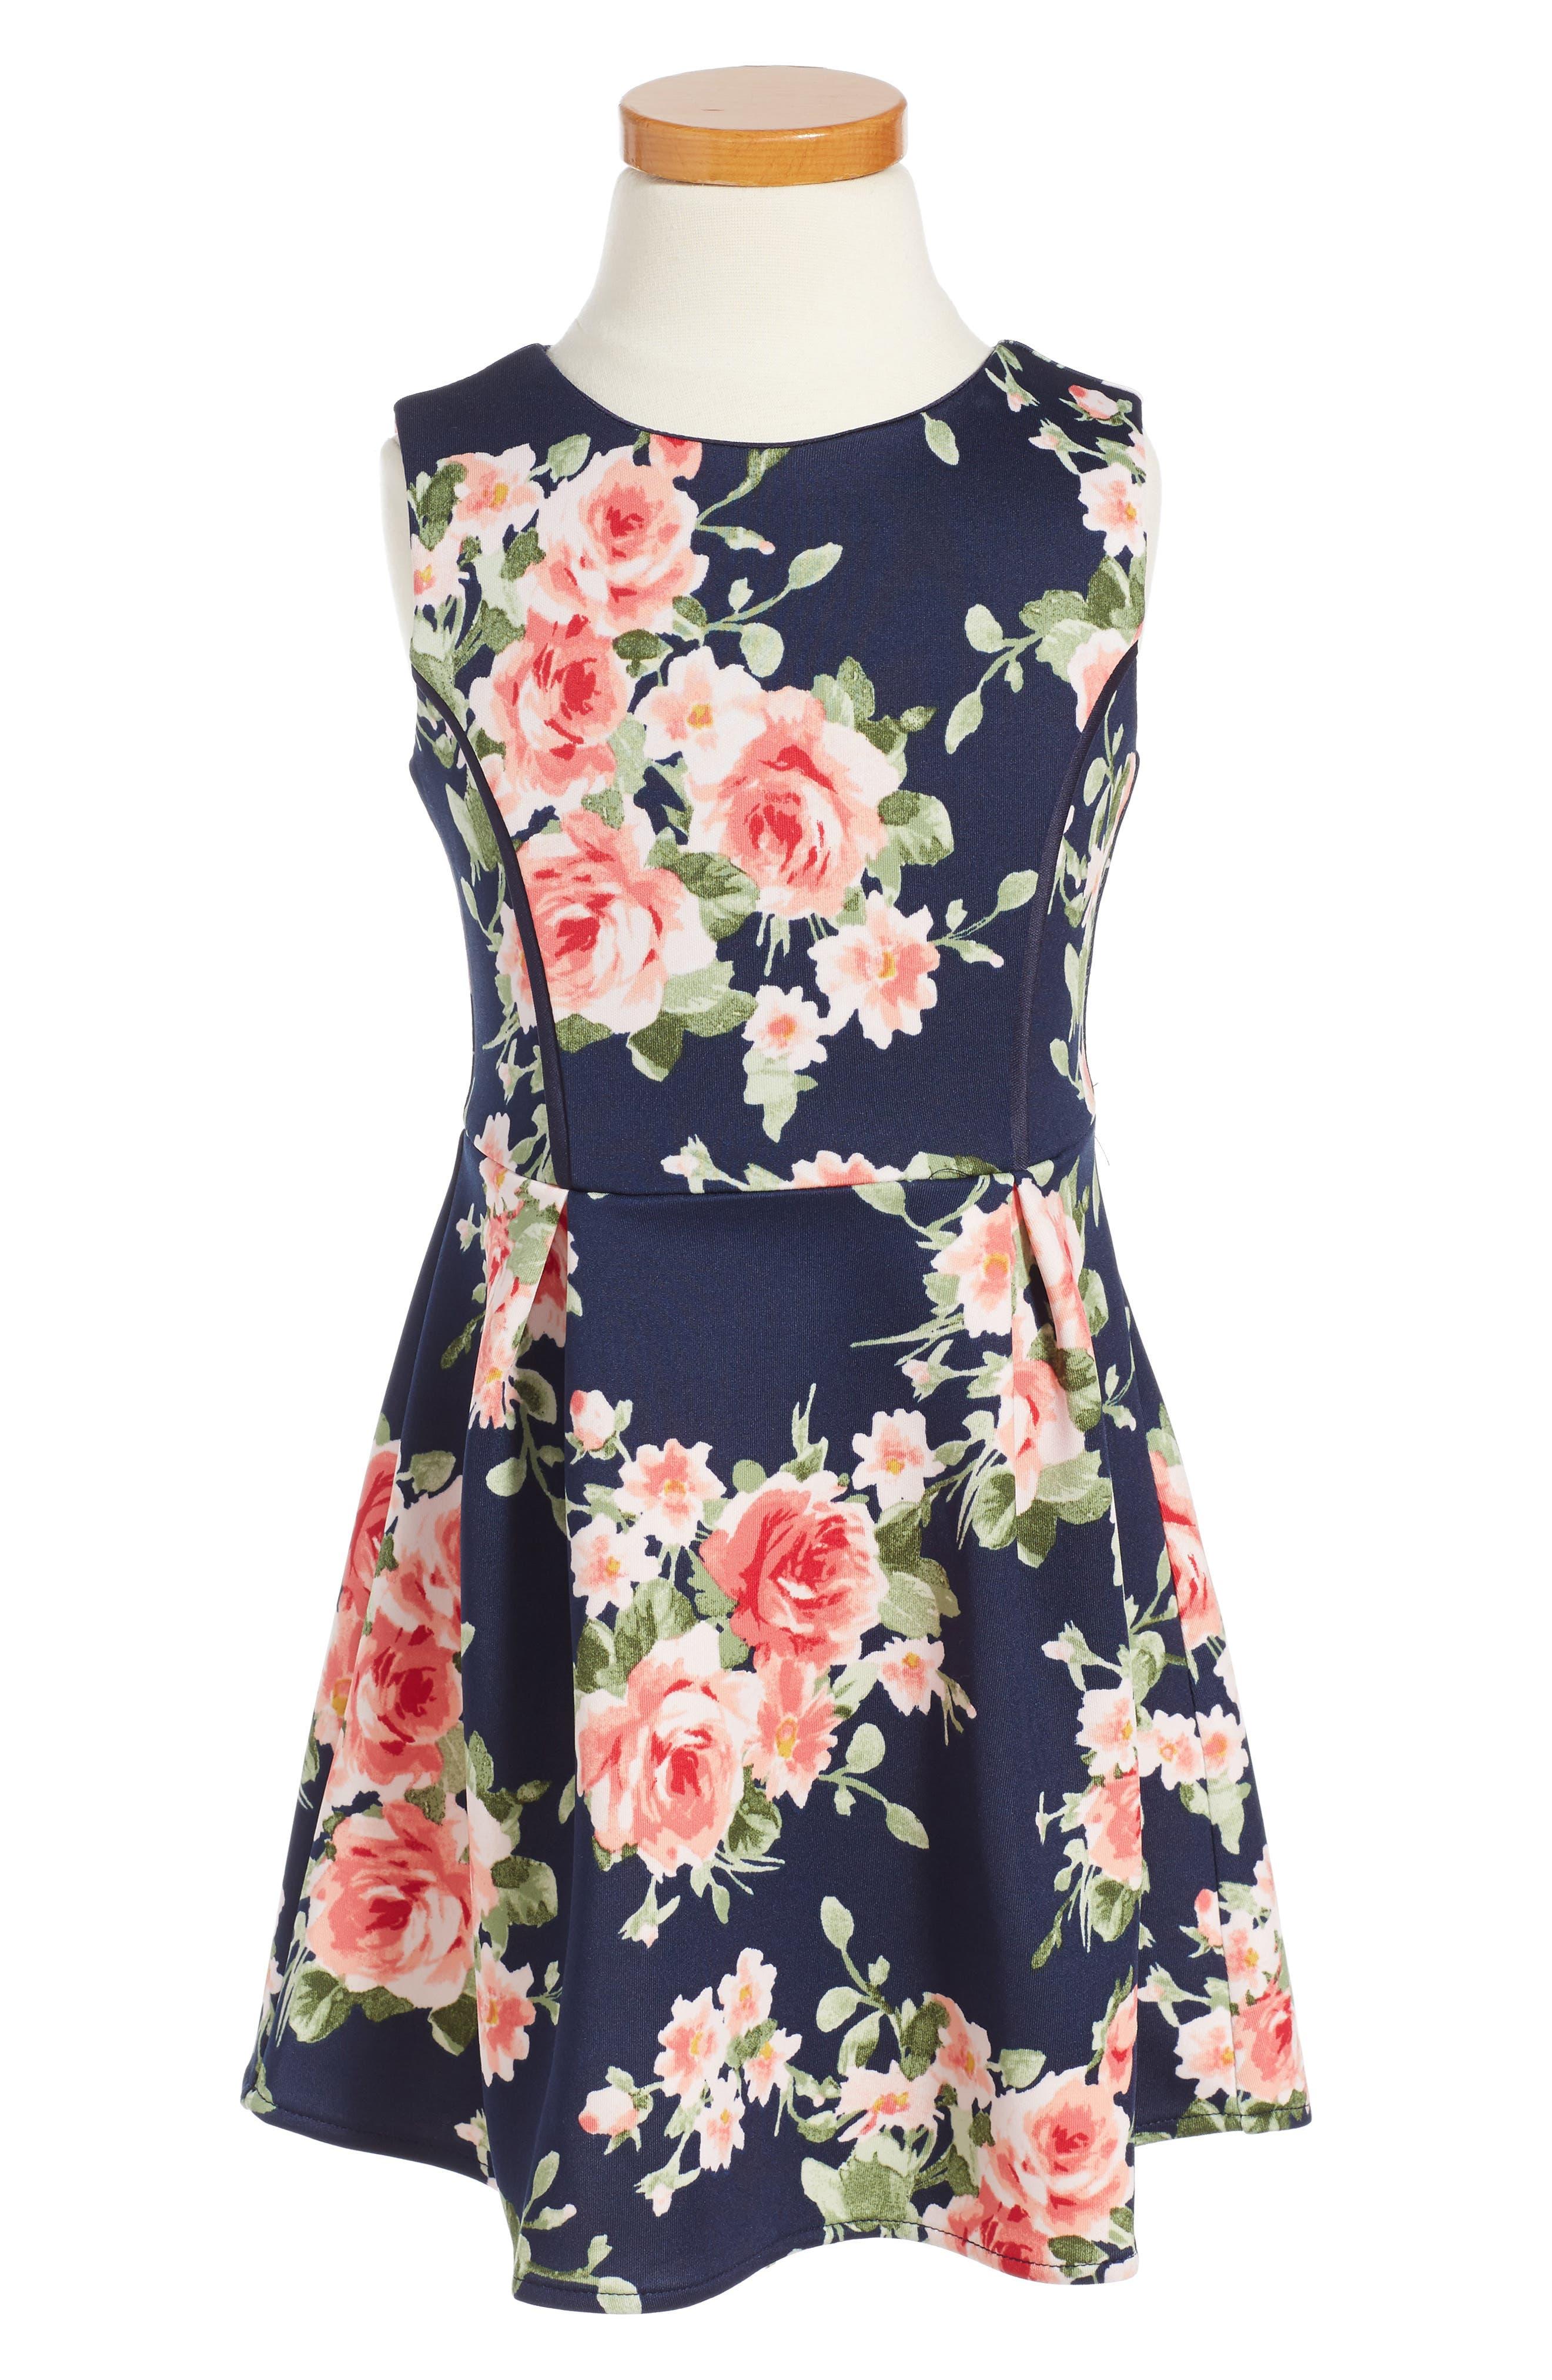 Monteau Couture Floral Dress (Little Girls)